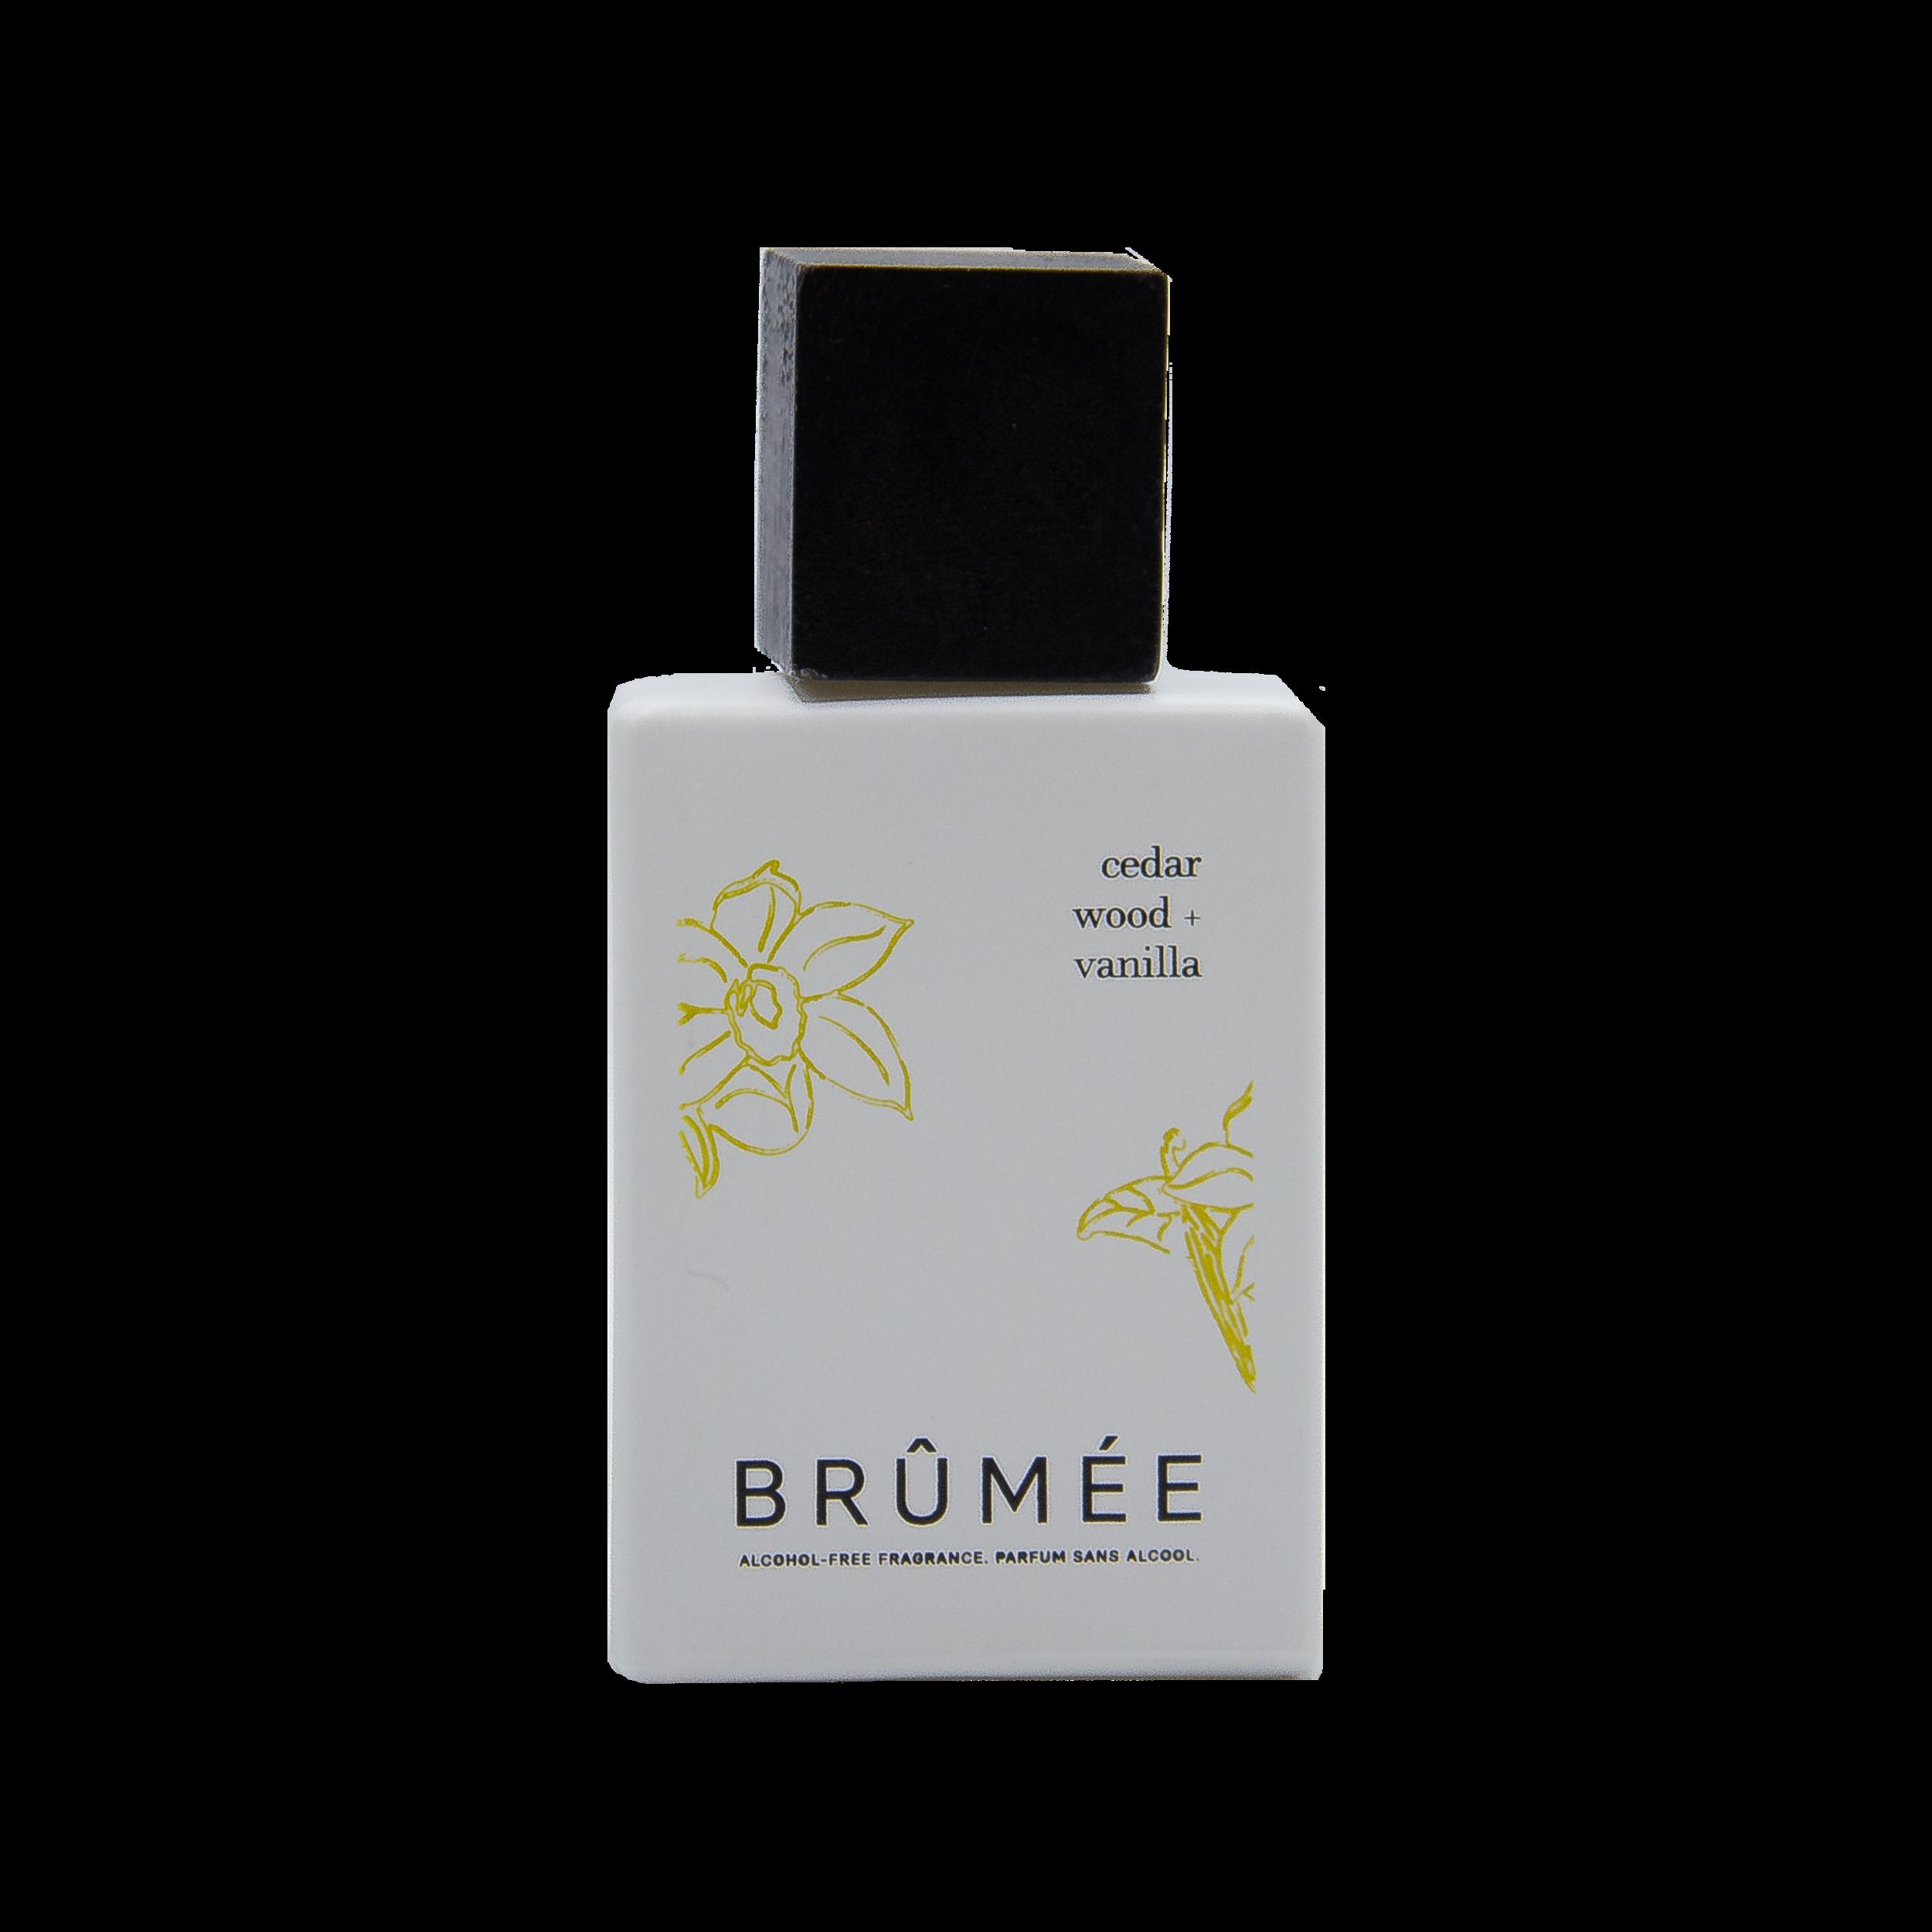 Cedar Wood + Vanilla - parfum Brumee